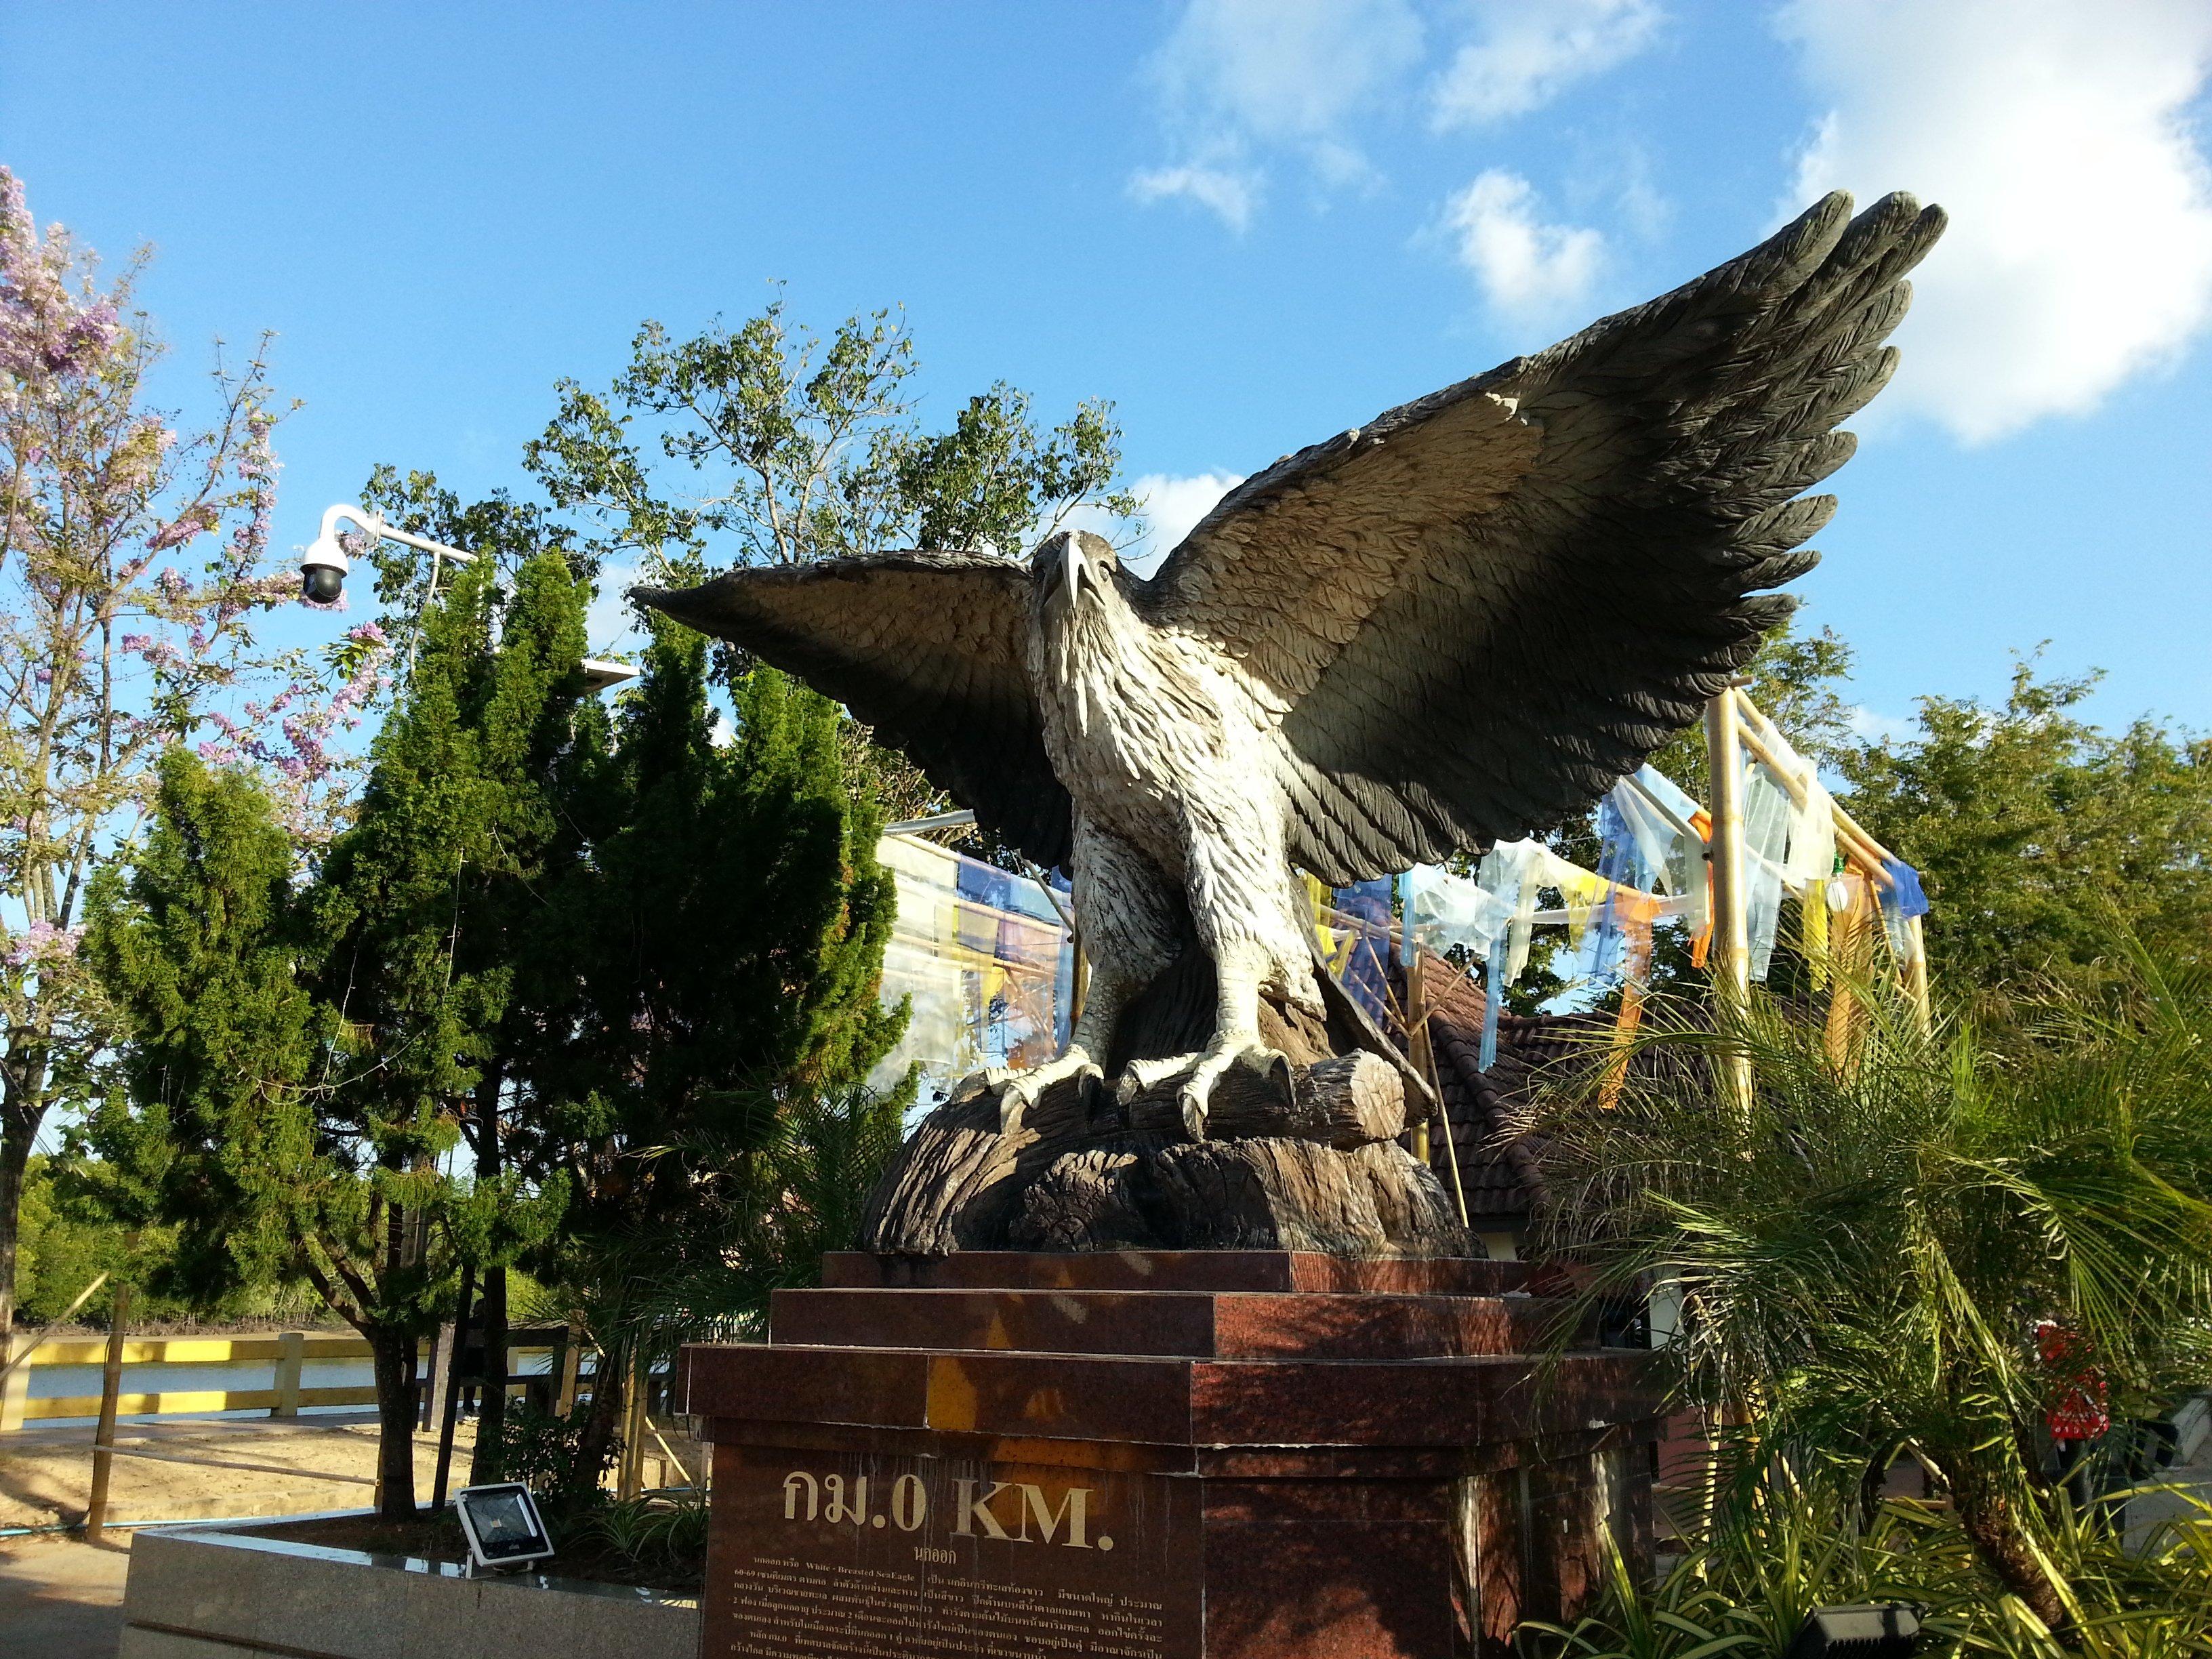 The sea eagle is the symbol of Krabi Municipality